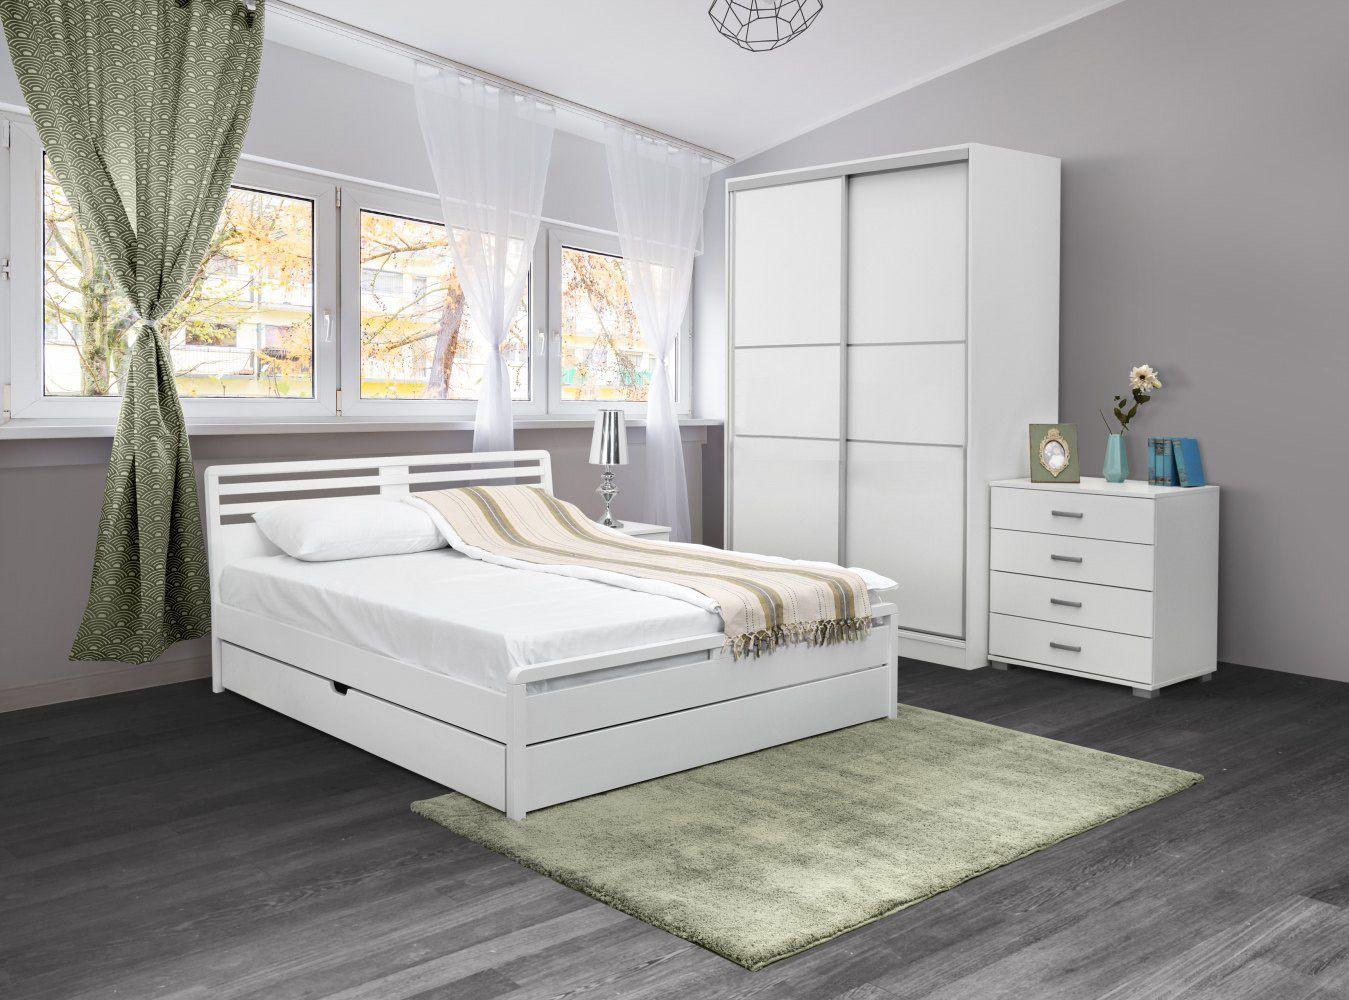 Schlafzimmer Komplett   Set G Pontevedra, 21 teilig, teilmassiv, Farbe Weiß